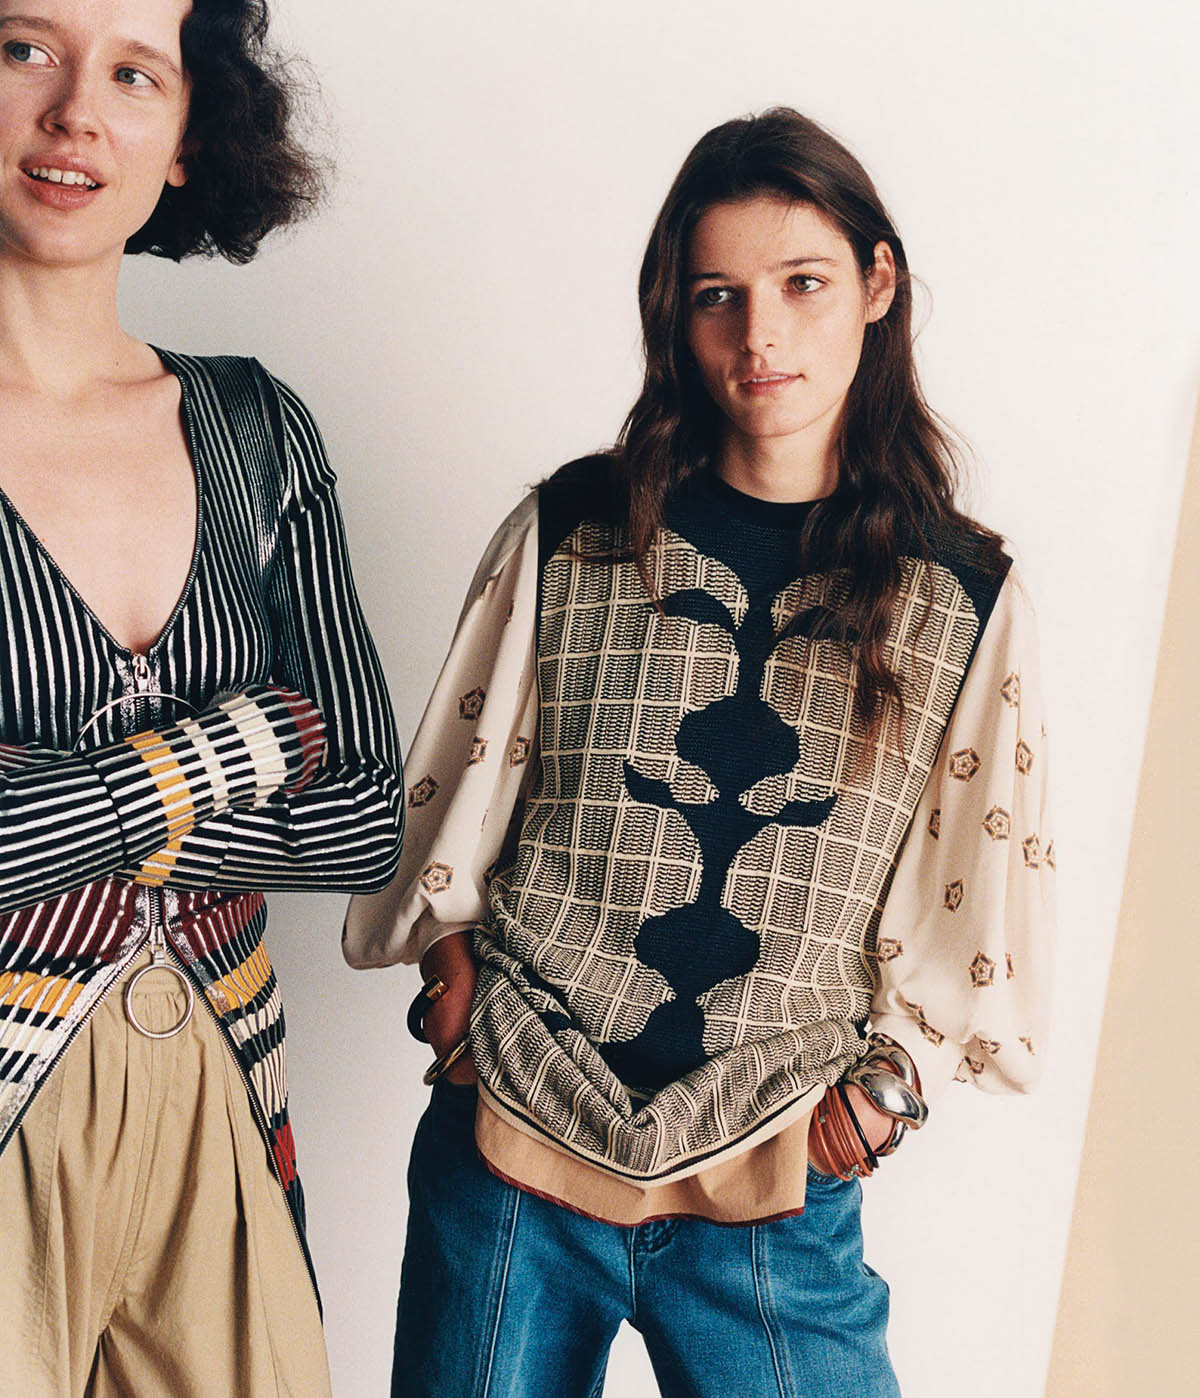 Effie Steinberg and Charlotte O'Donnell by Krisztián Éder for WSJ. Magazine Spring 2021